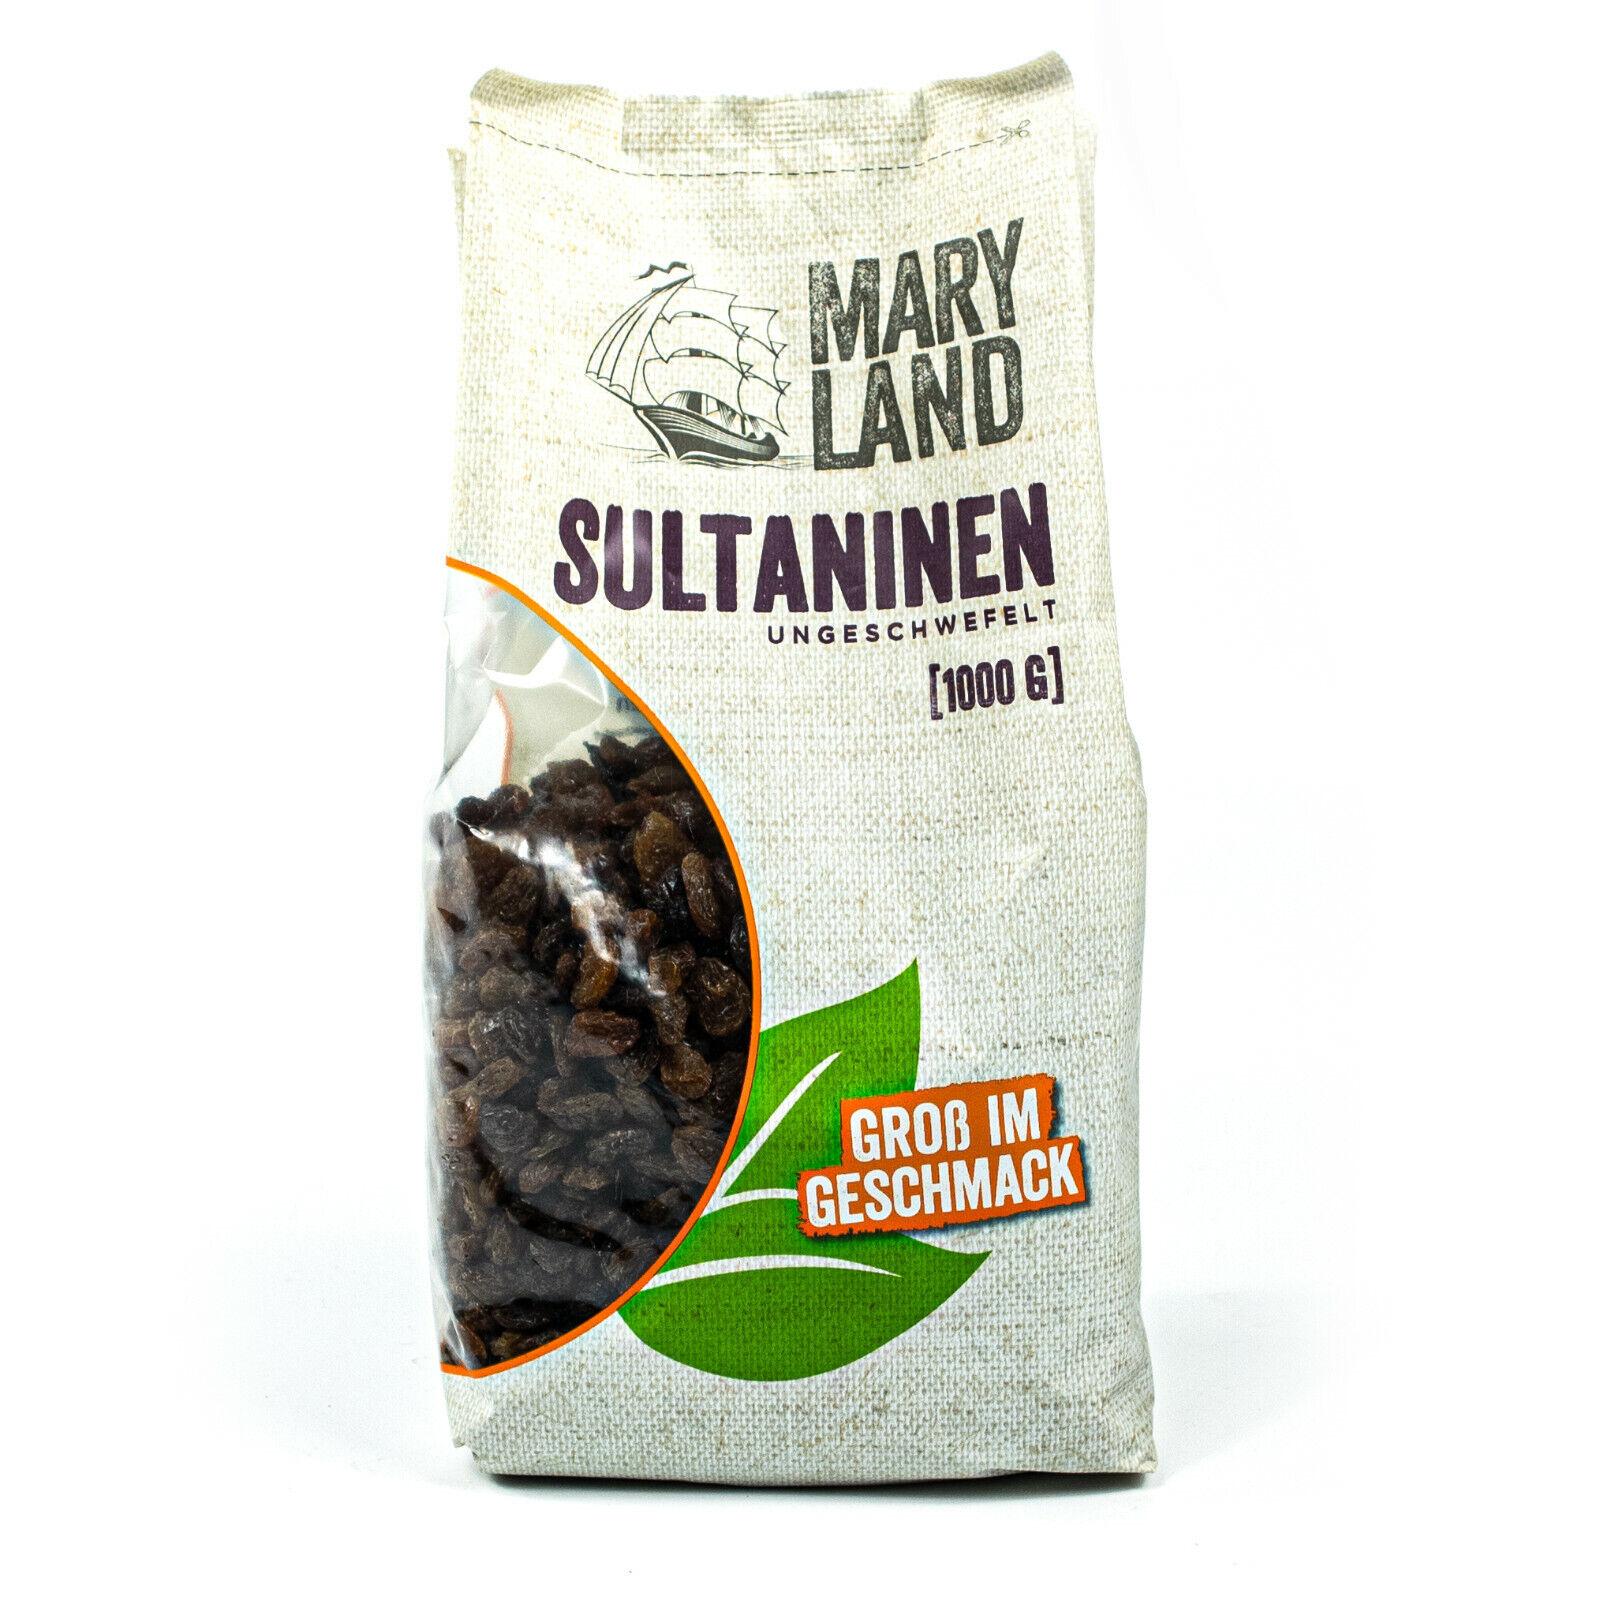 Maryland - Sultaninen ungeschwefelt 1 kg - Rosinen saftig, fruchtig & süß